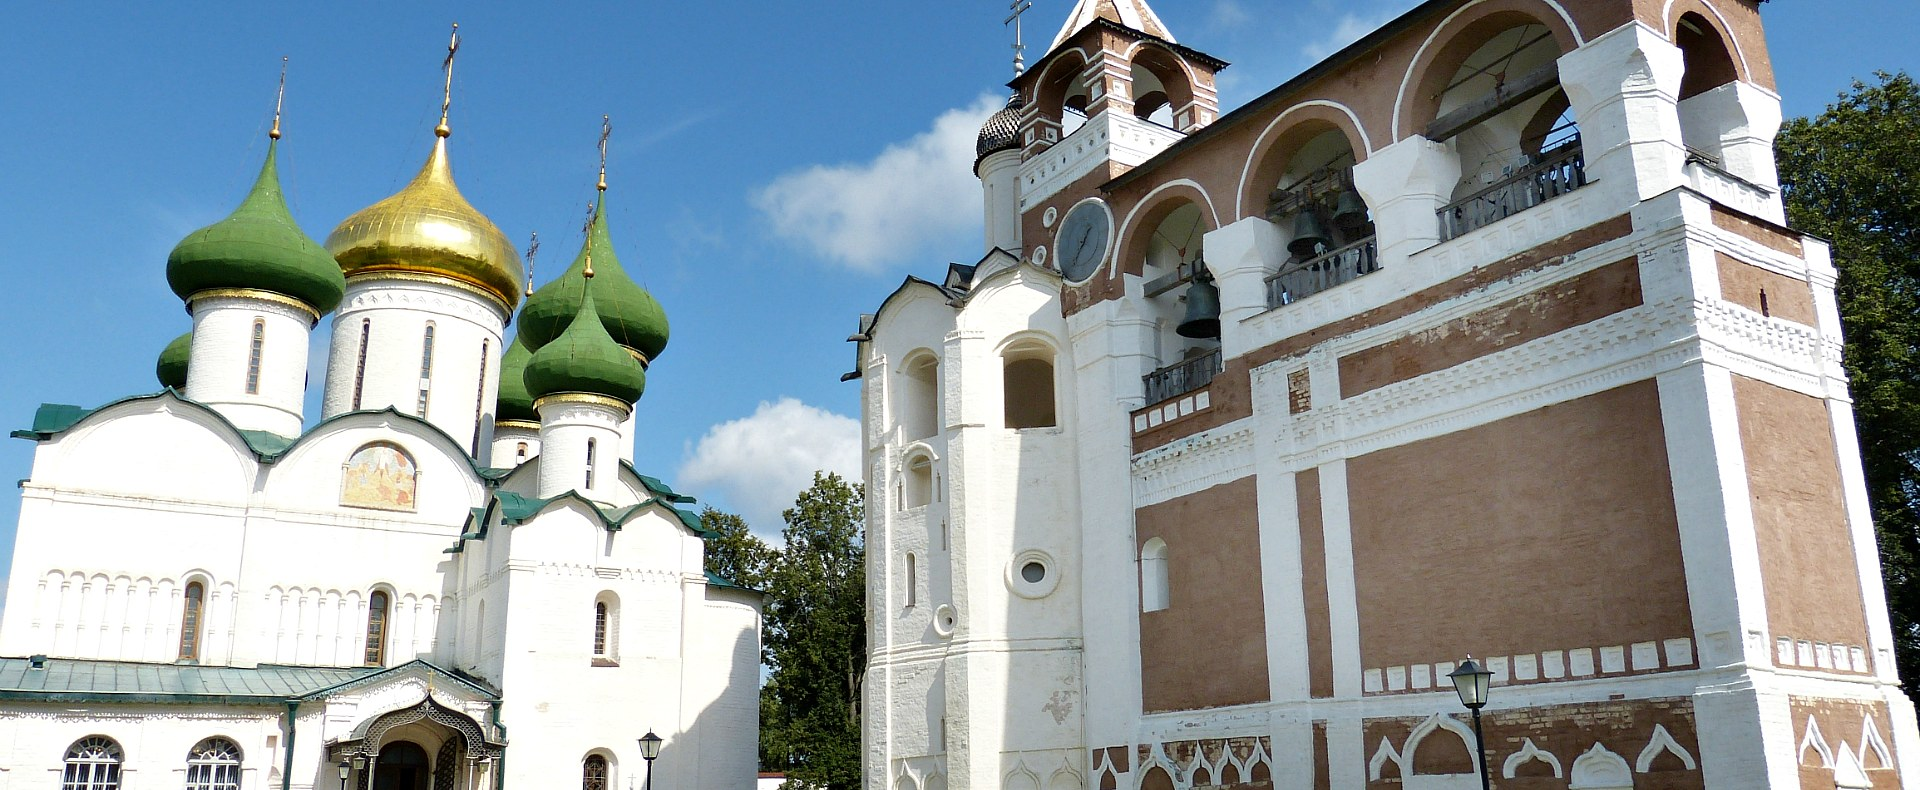 Suzdal, Russia Hub Gallery